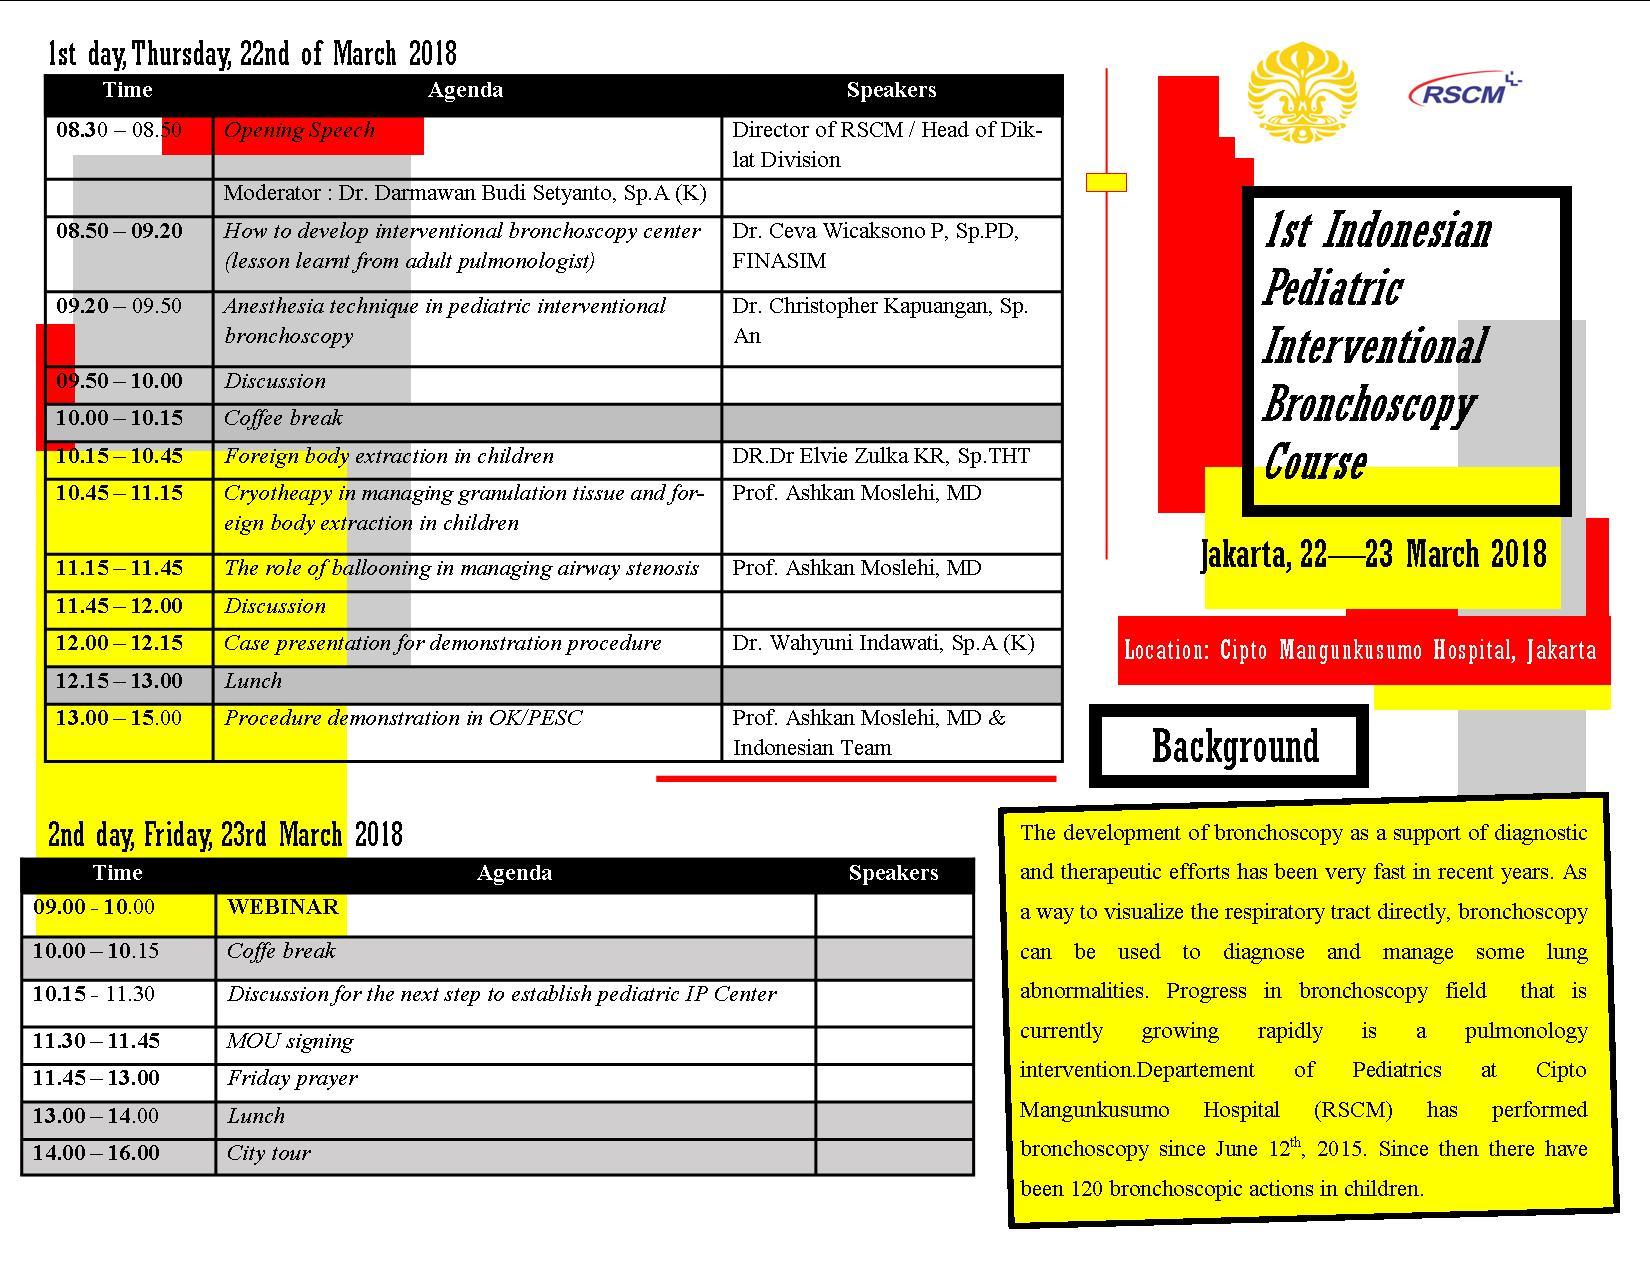 1st Indonesian Pediatric Interventional Bronchoscopy Course